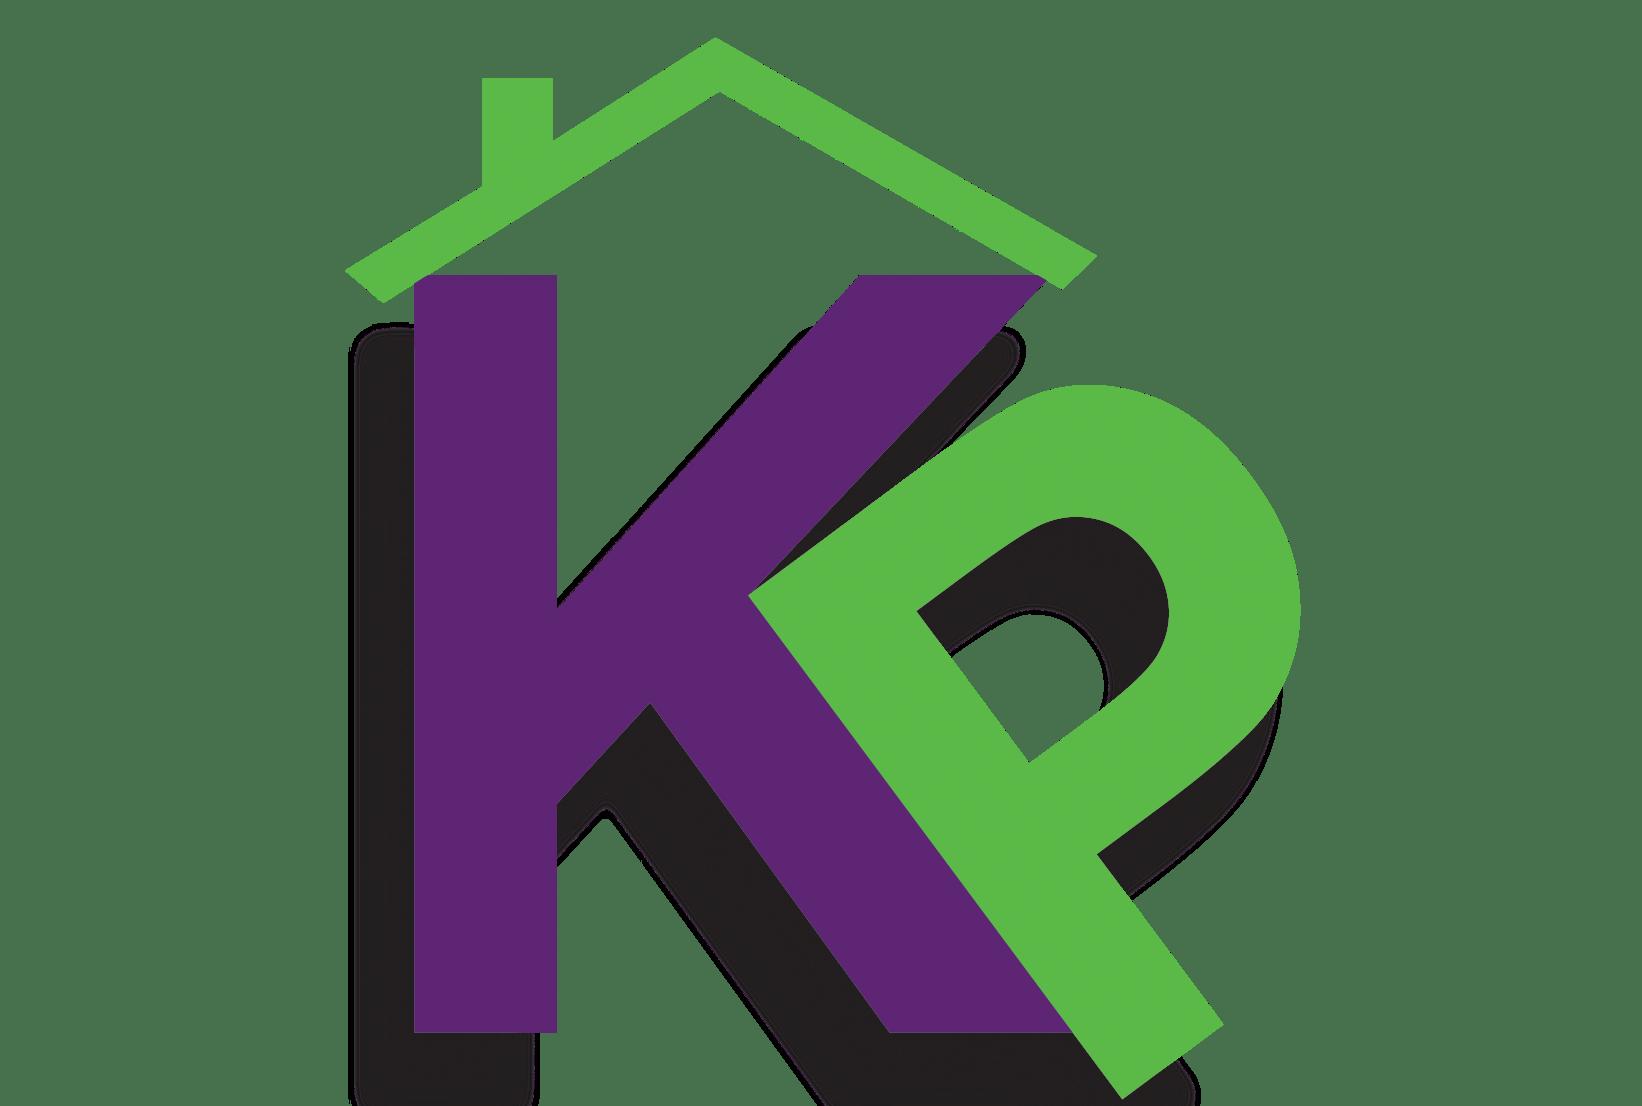 KP Building Approvals